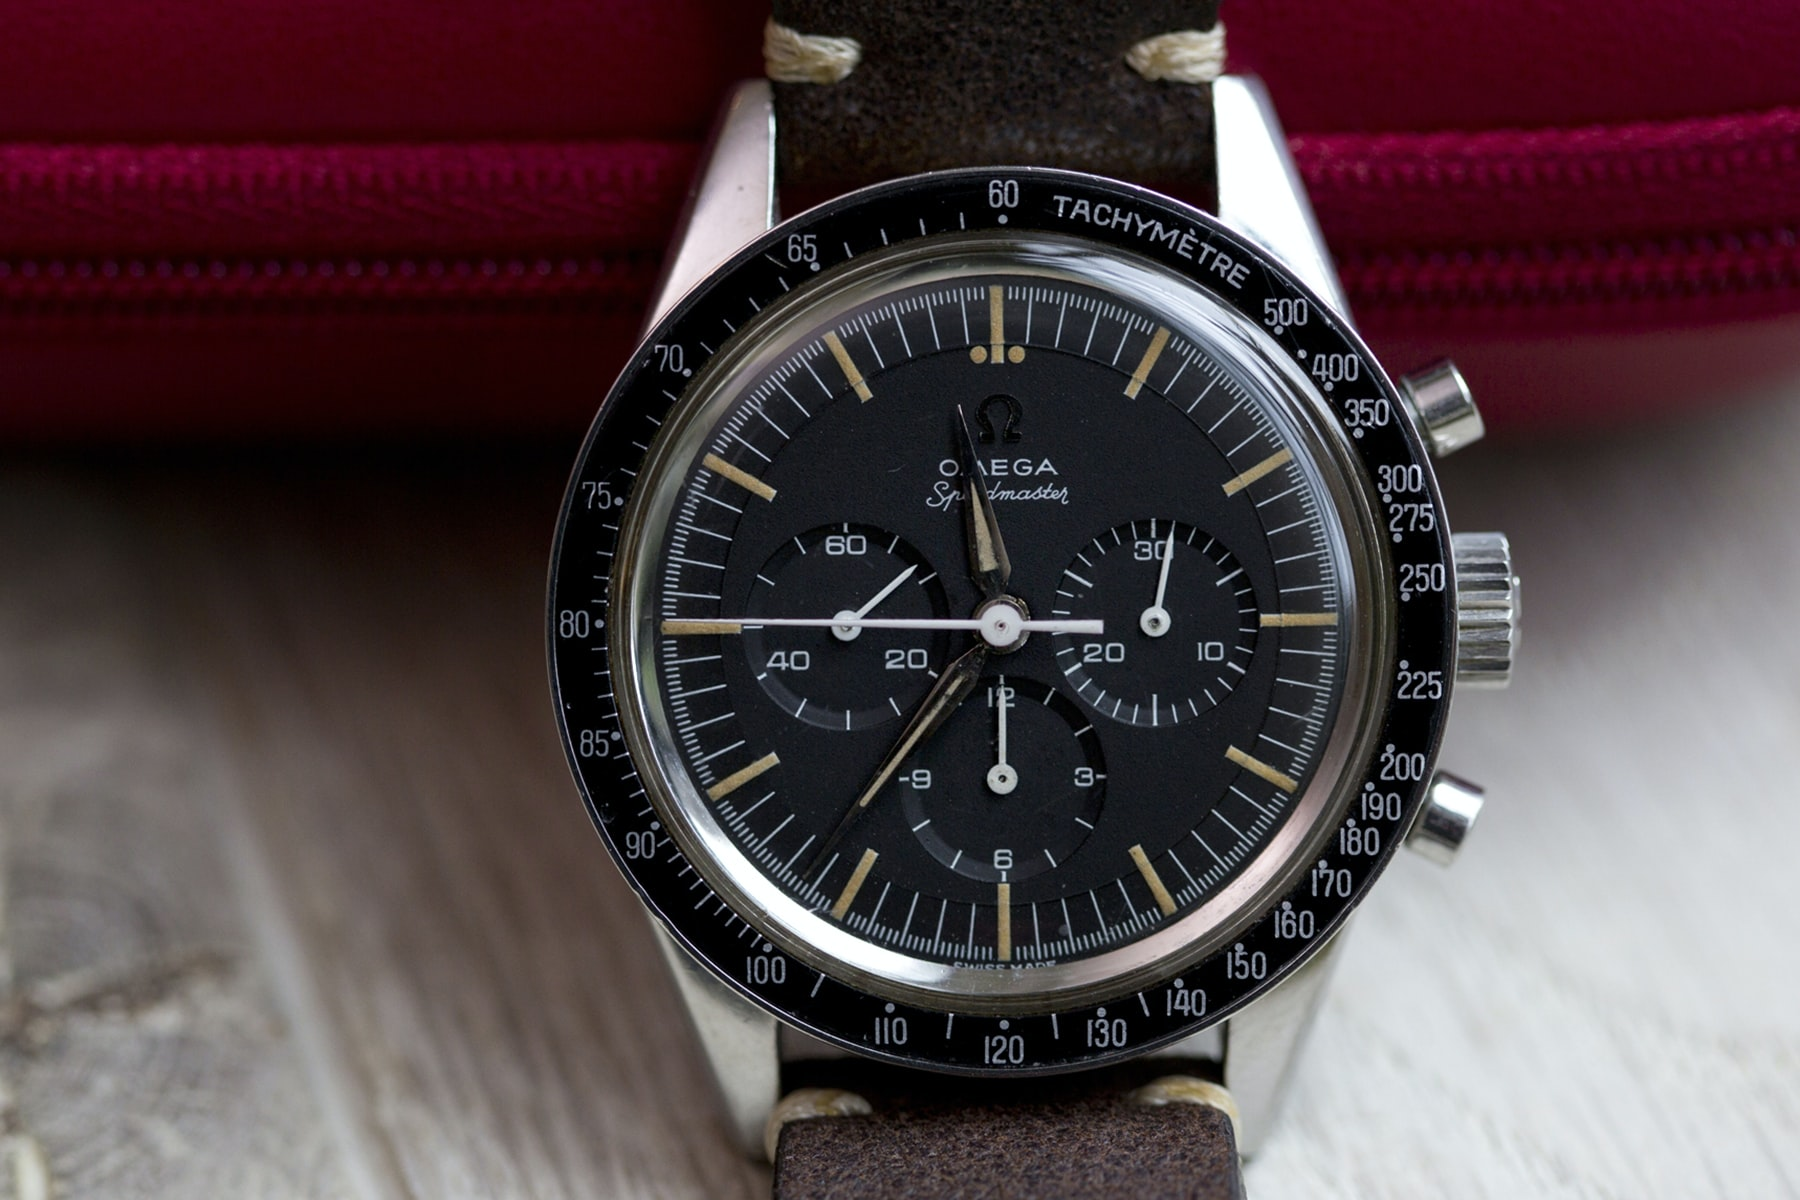 A Week On The Wrist: The Omega Speedmaster 'First Omega In Space' A Week On The Wrist: The Omega Speedmaster 'First Omega In Space' 222